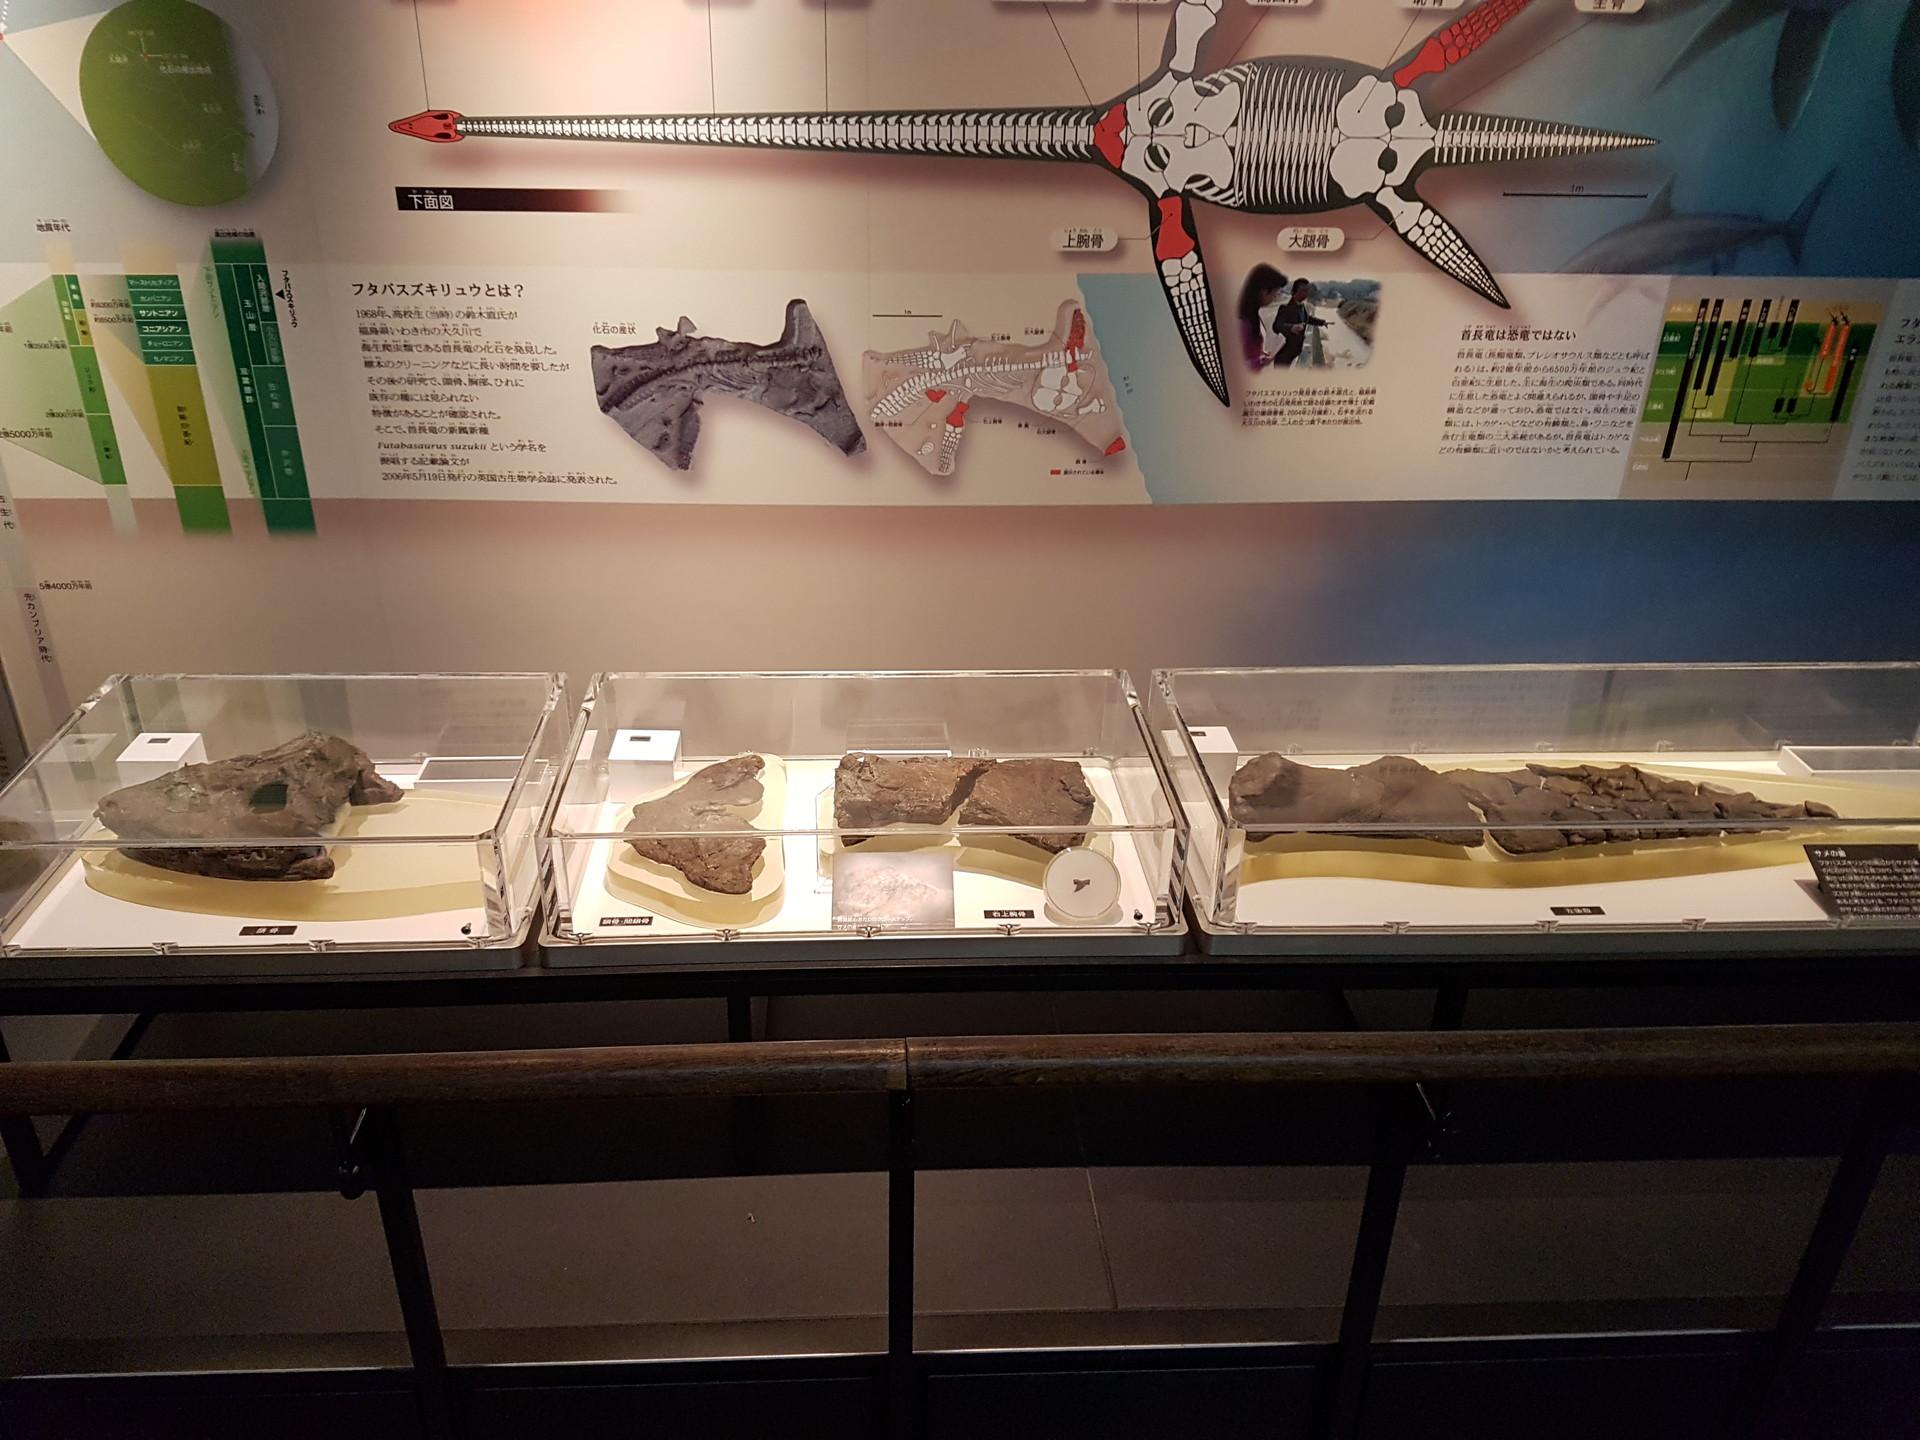 geeking-tokyo-national-museum-science-8b